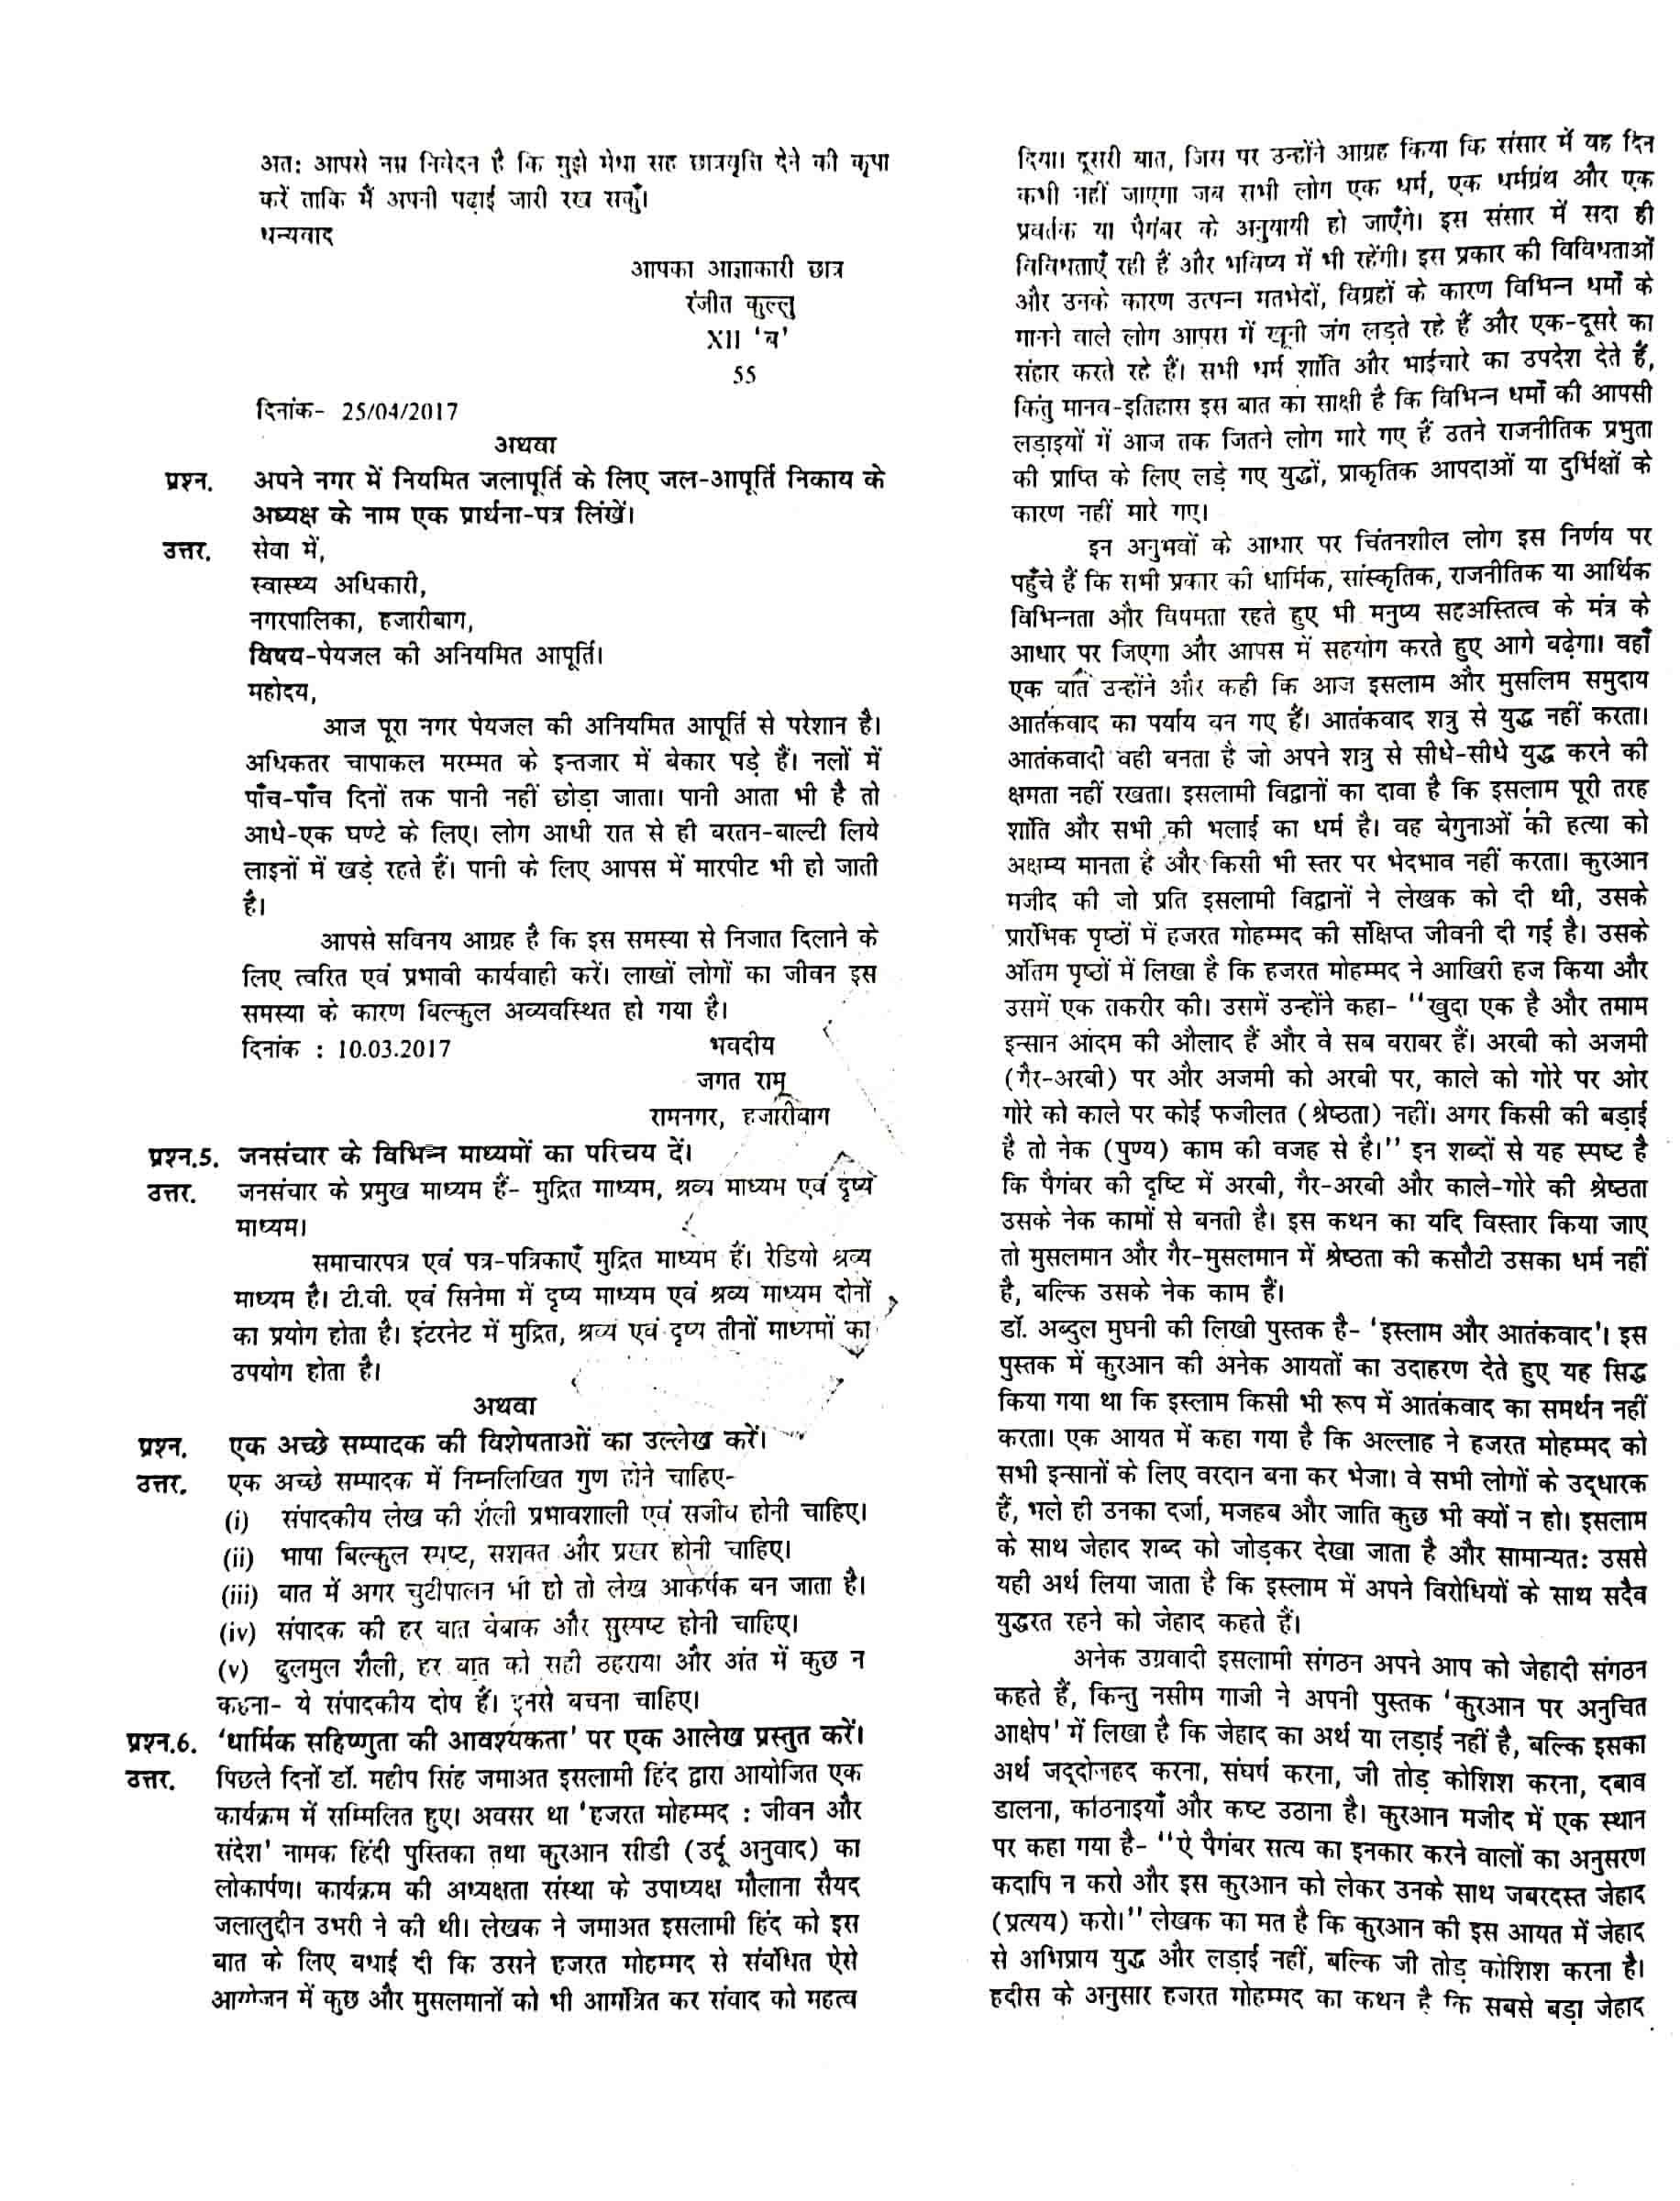 JAC Class 12 hindi 2017 Question Paper 03